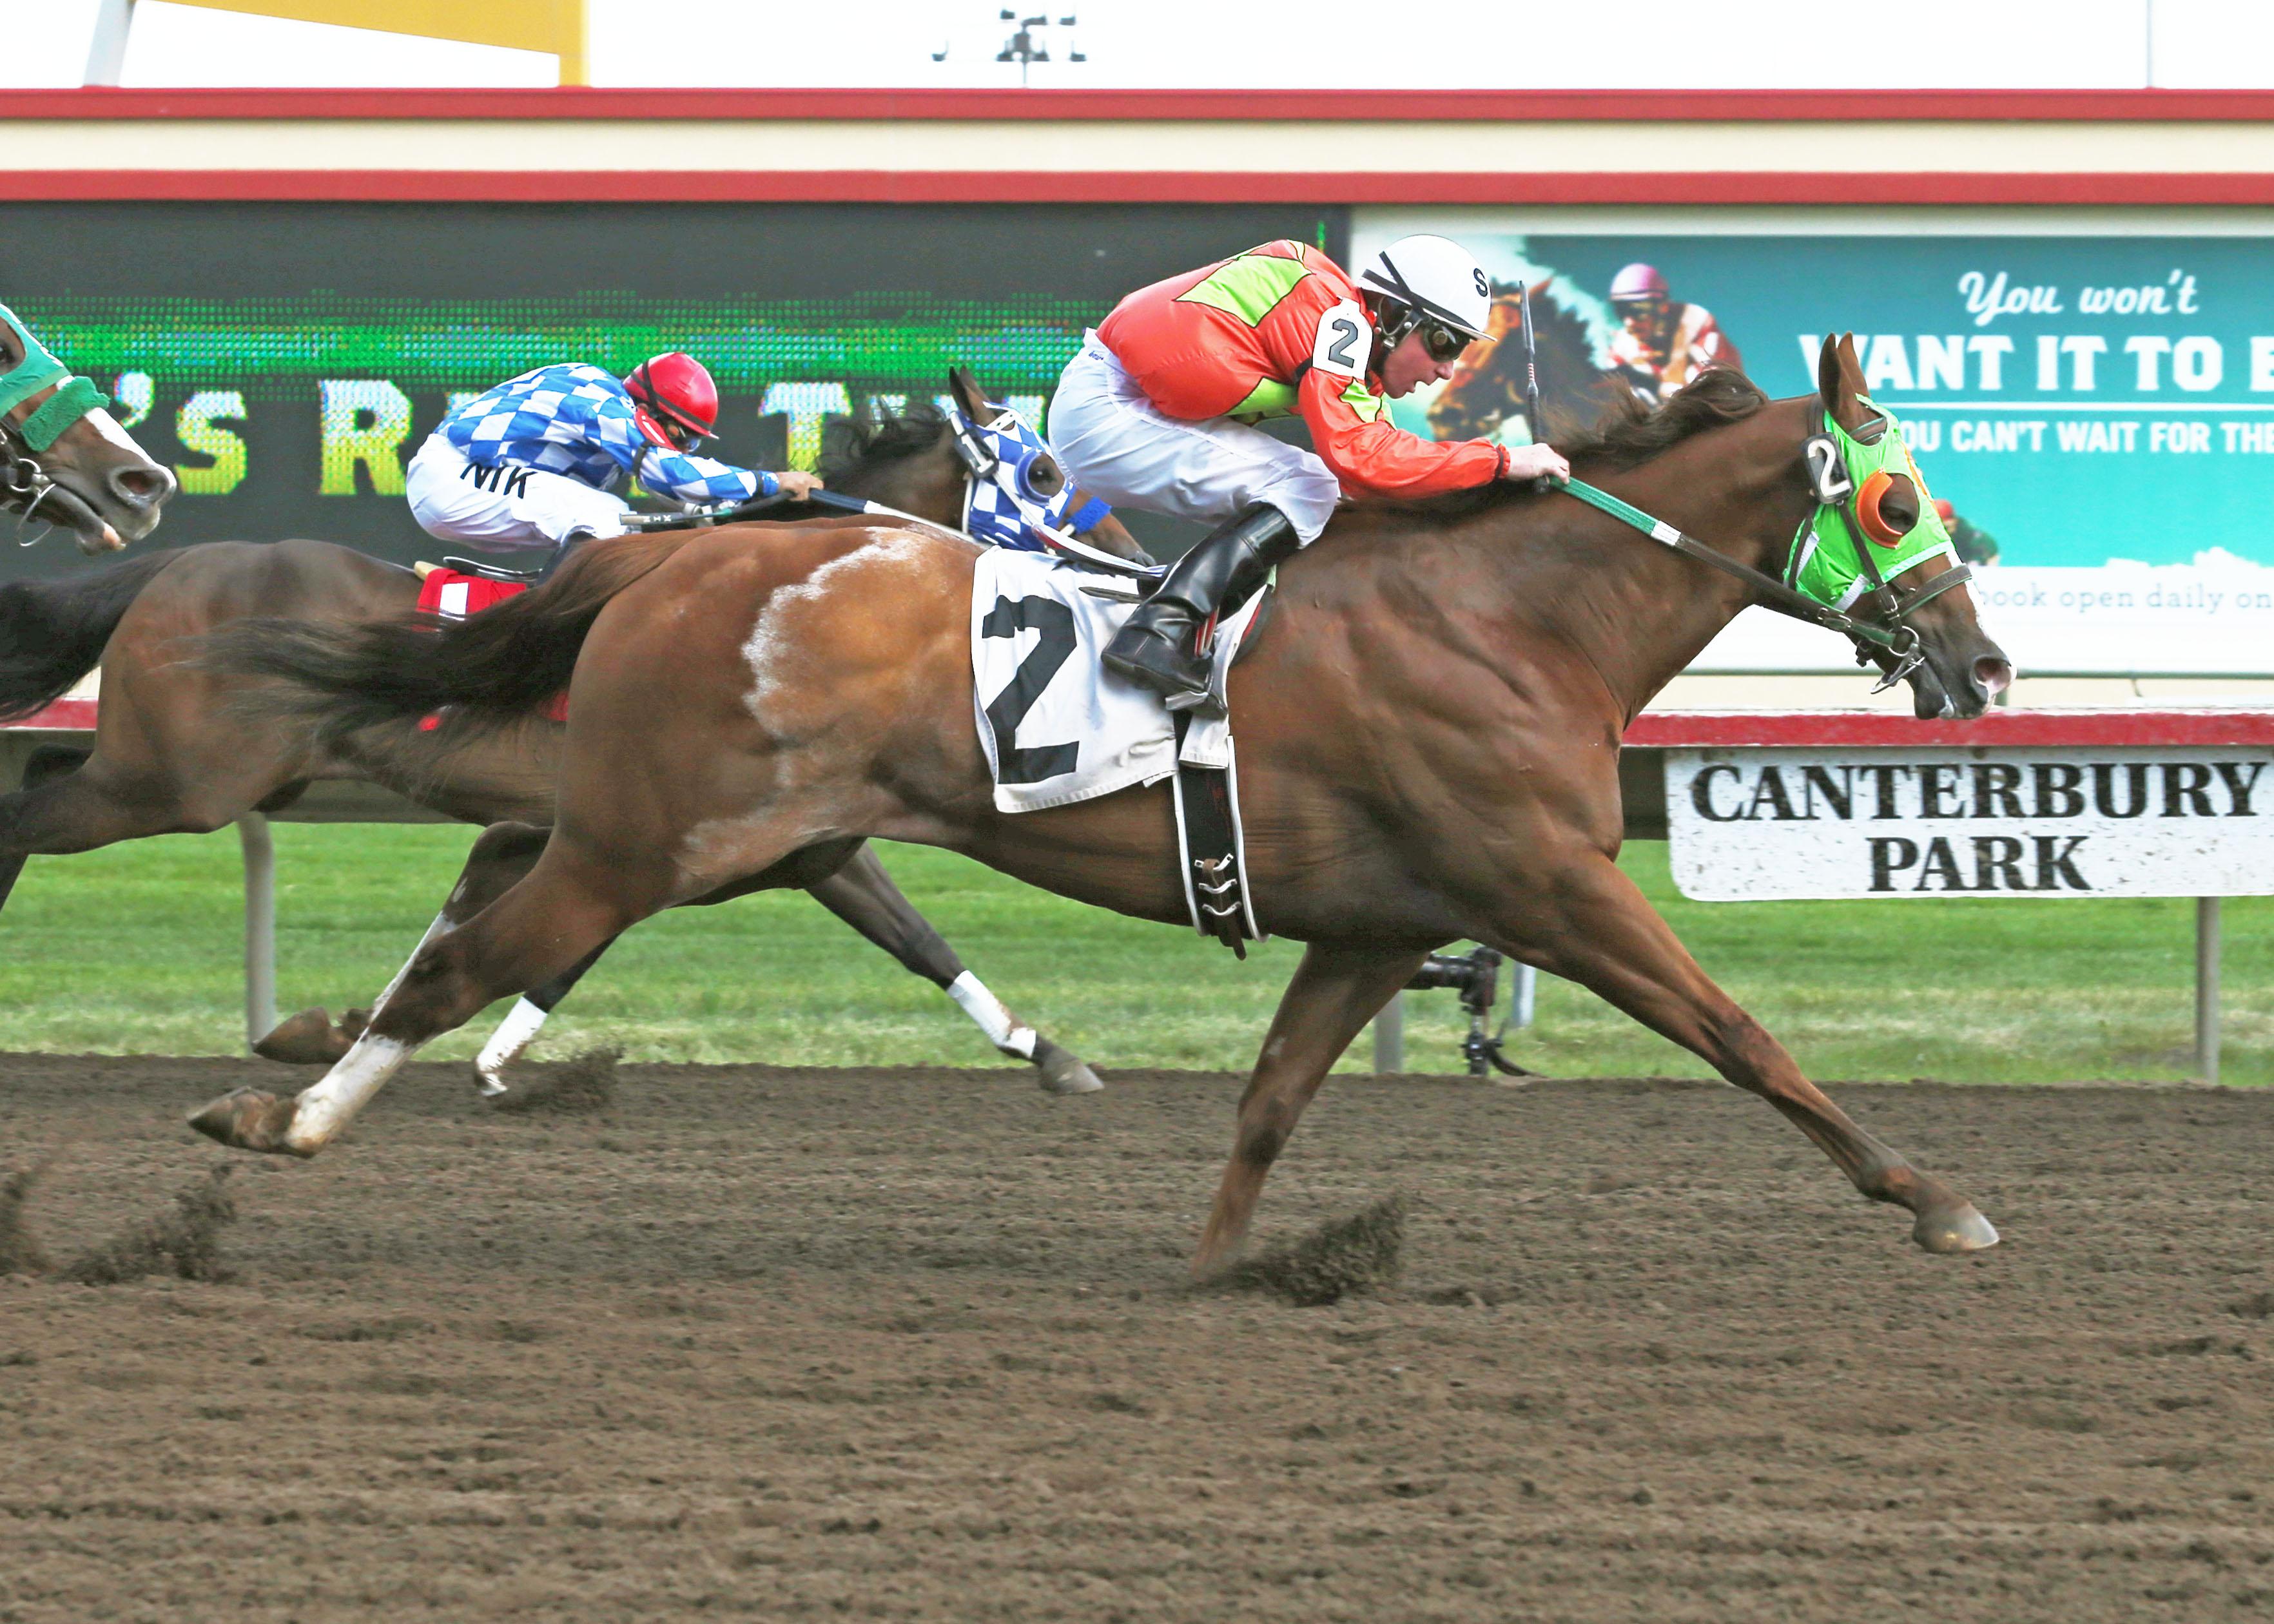 BF Farm Boy - Great Lakes Stakes - 07-03-13 - R02 - CBY - Finish